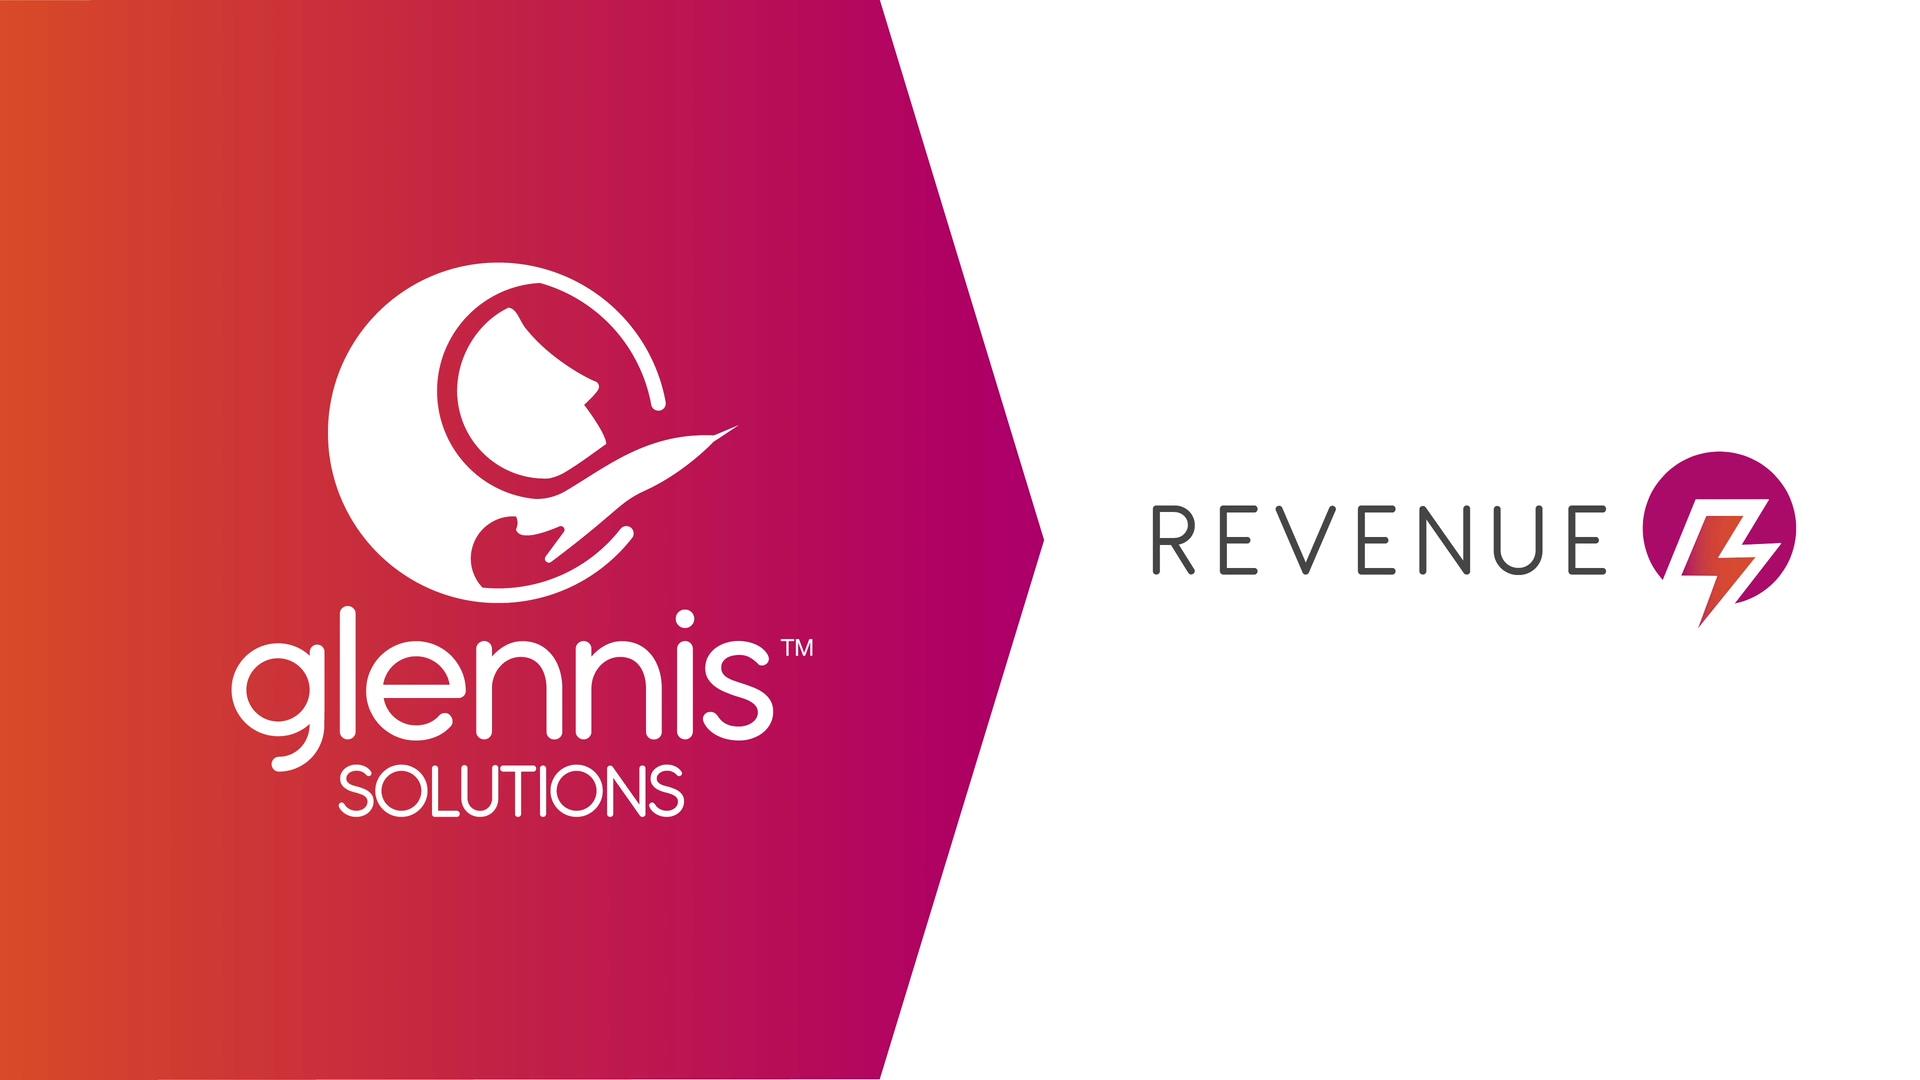 Glennis REVENUE (4) (2)